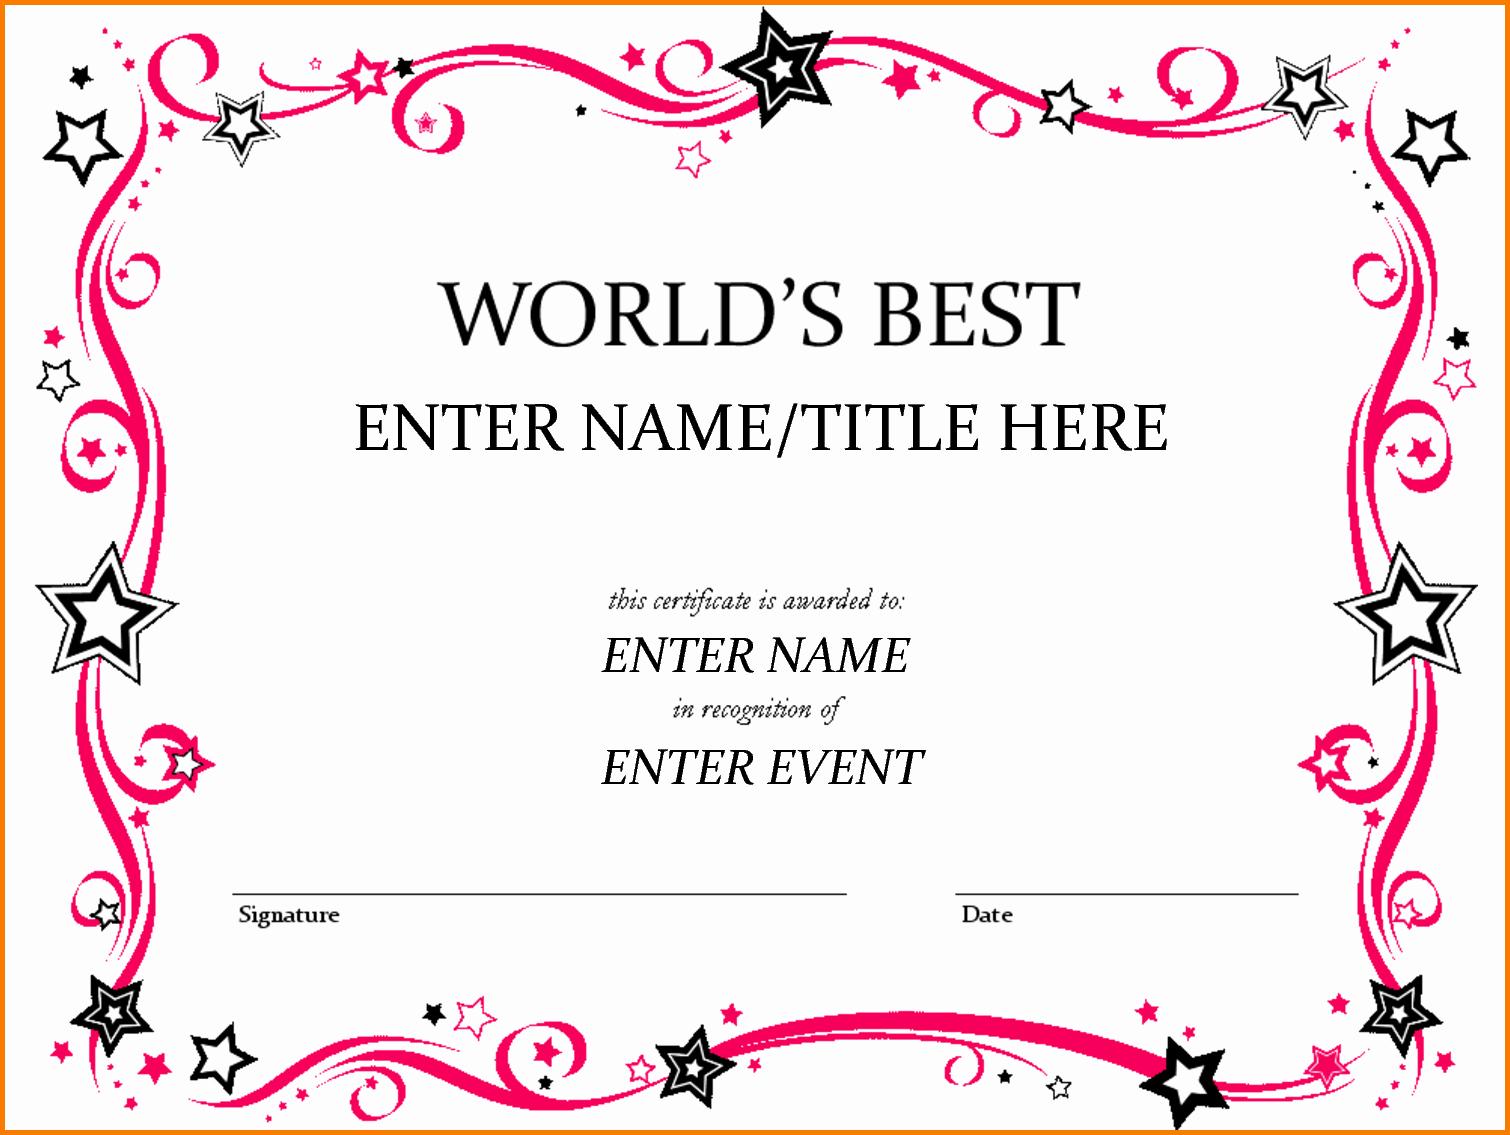 Certificate Of Award Template Free Luxury Award Template Word